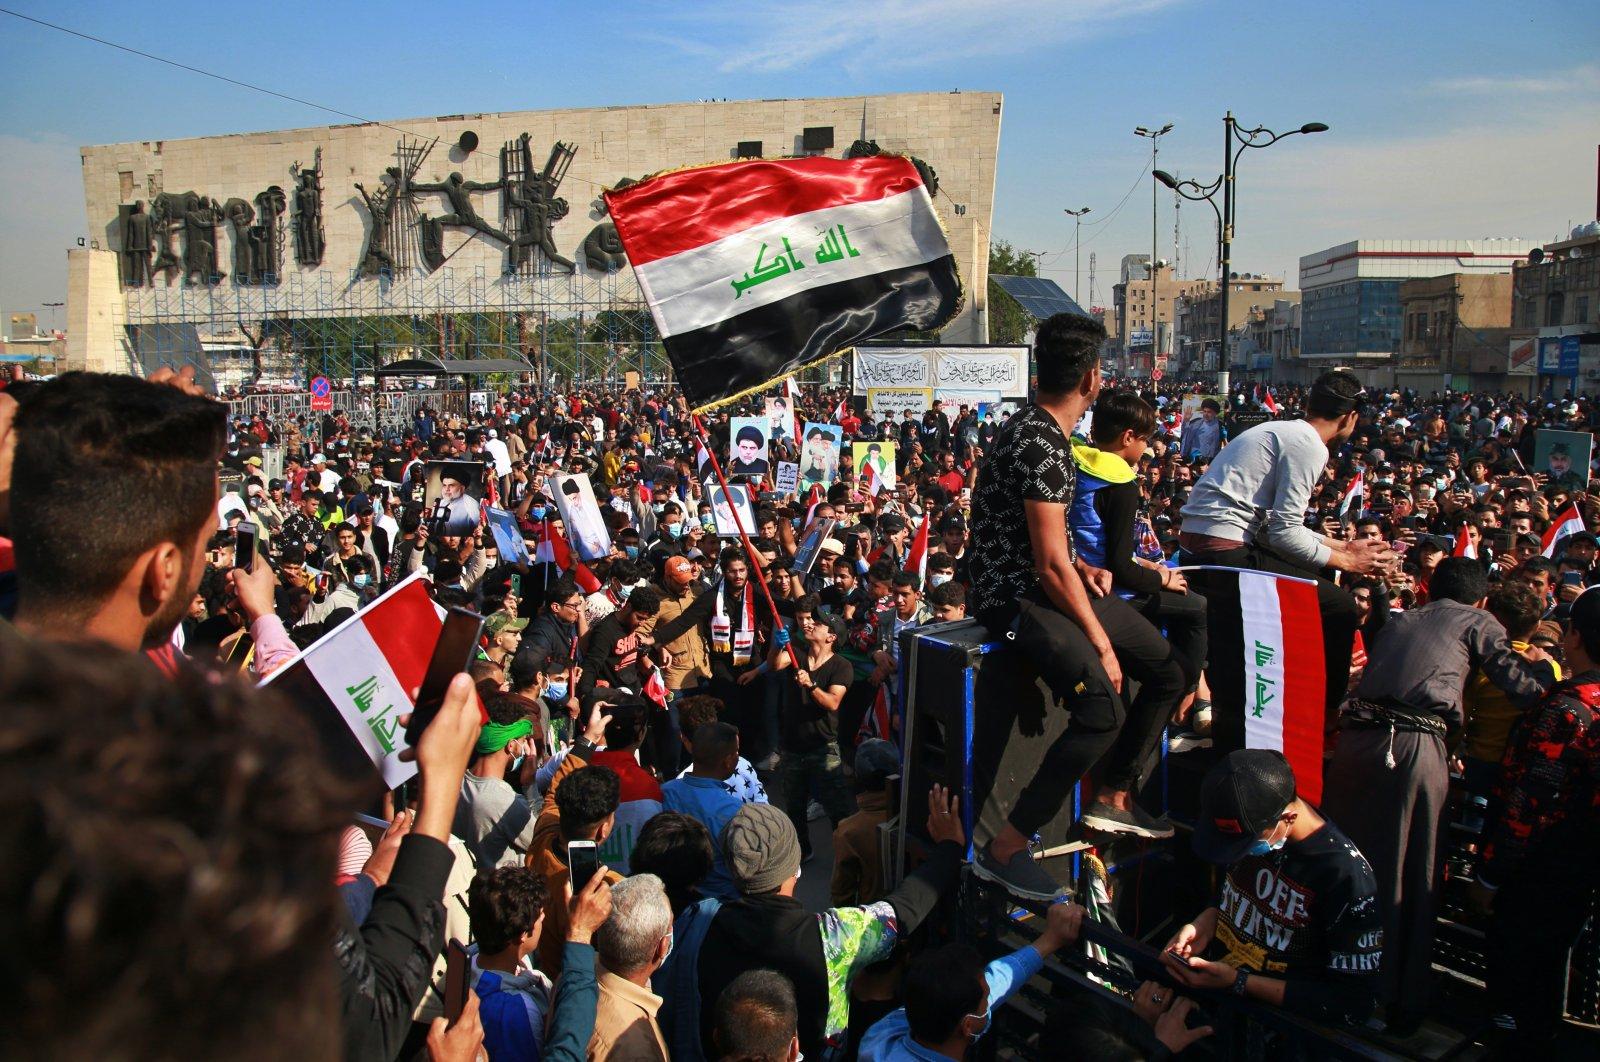 Followers of Shiite cleric Muqtada al-Sadr gather in Tahrir Square, Baghdad, Iraq, Nov. 27, 2020. (AP Photo)